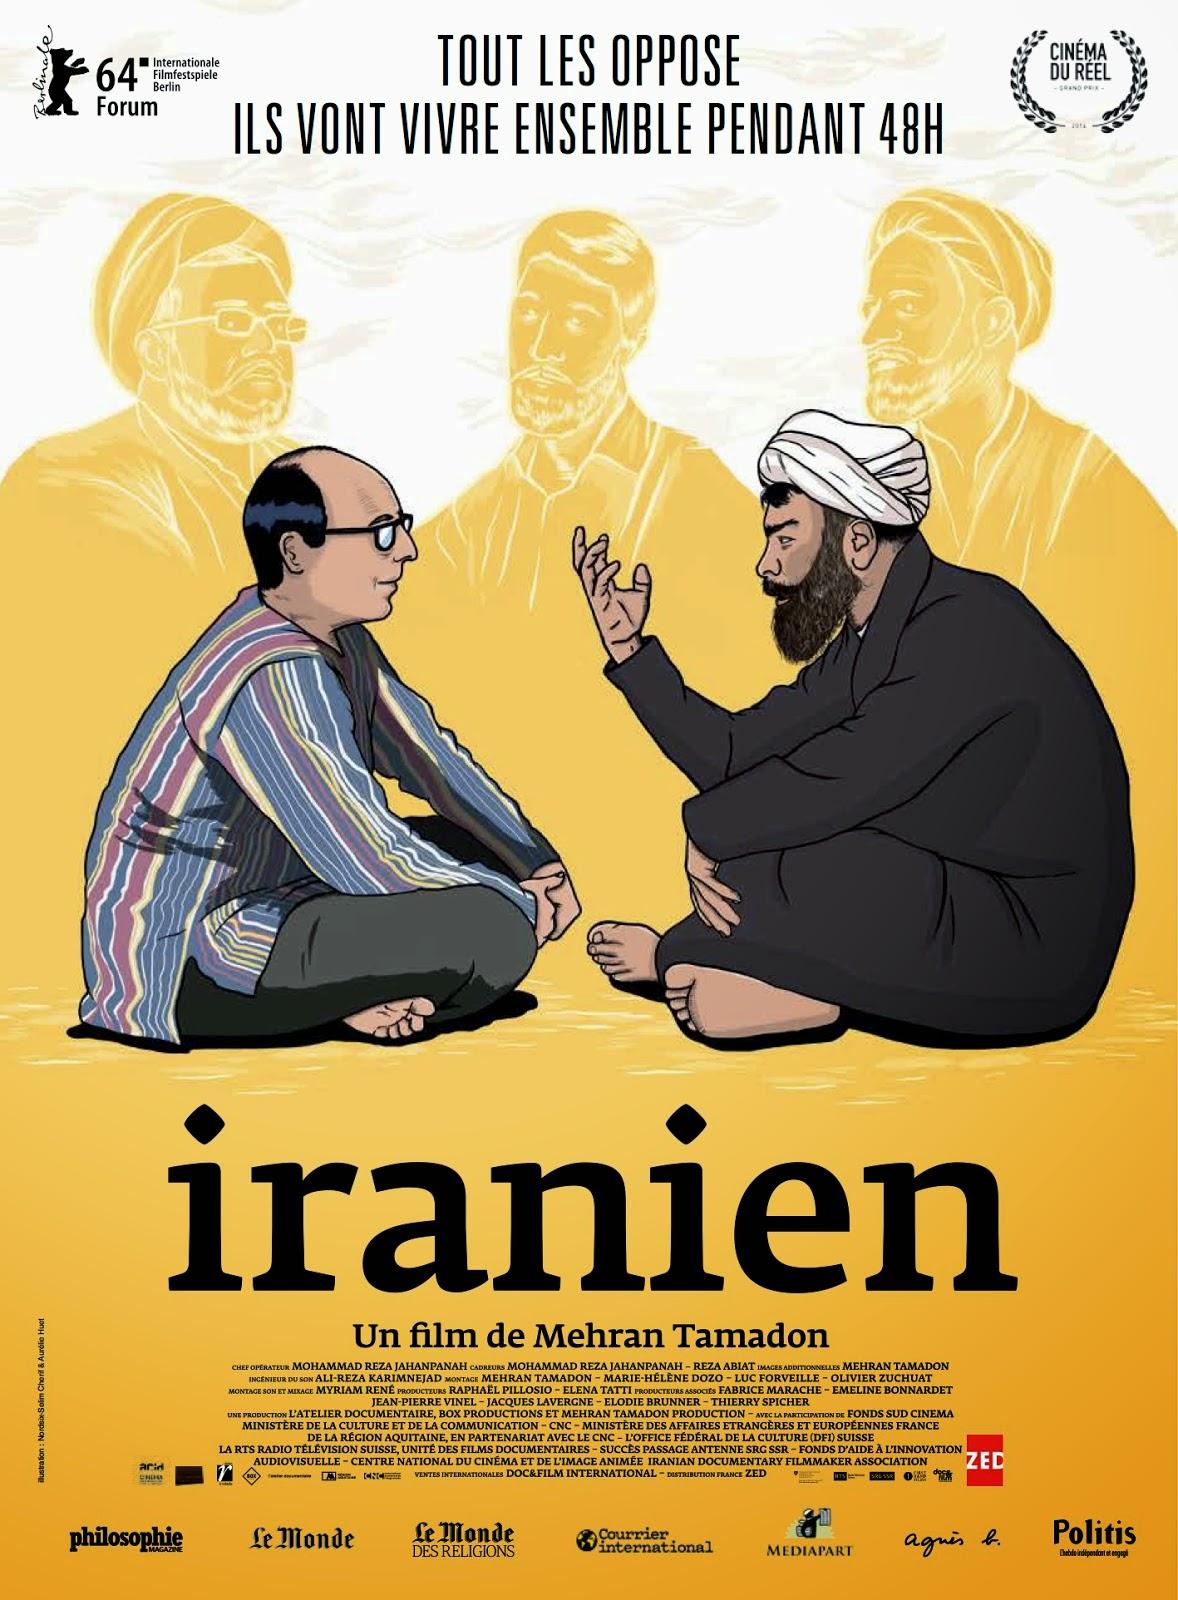 "[ITW] Mehran Tamadon, réalisateur de ""Iranien"" (2014) 1 image"